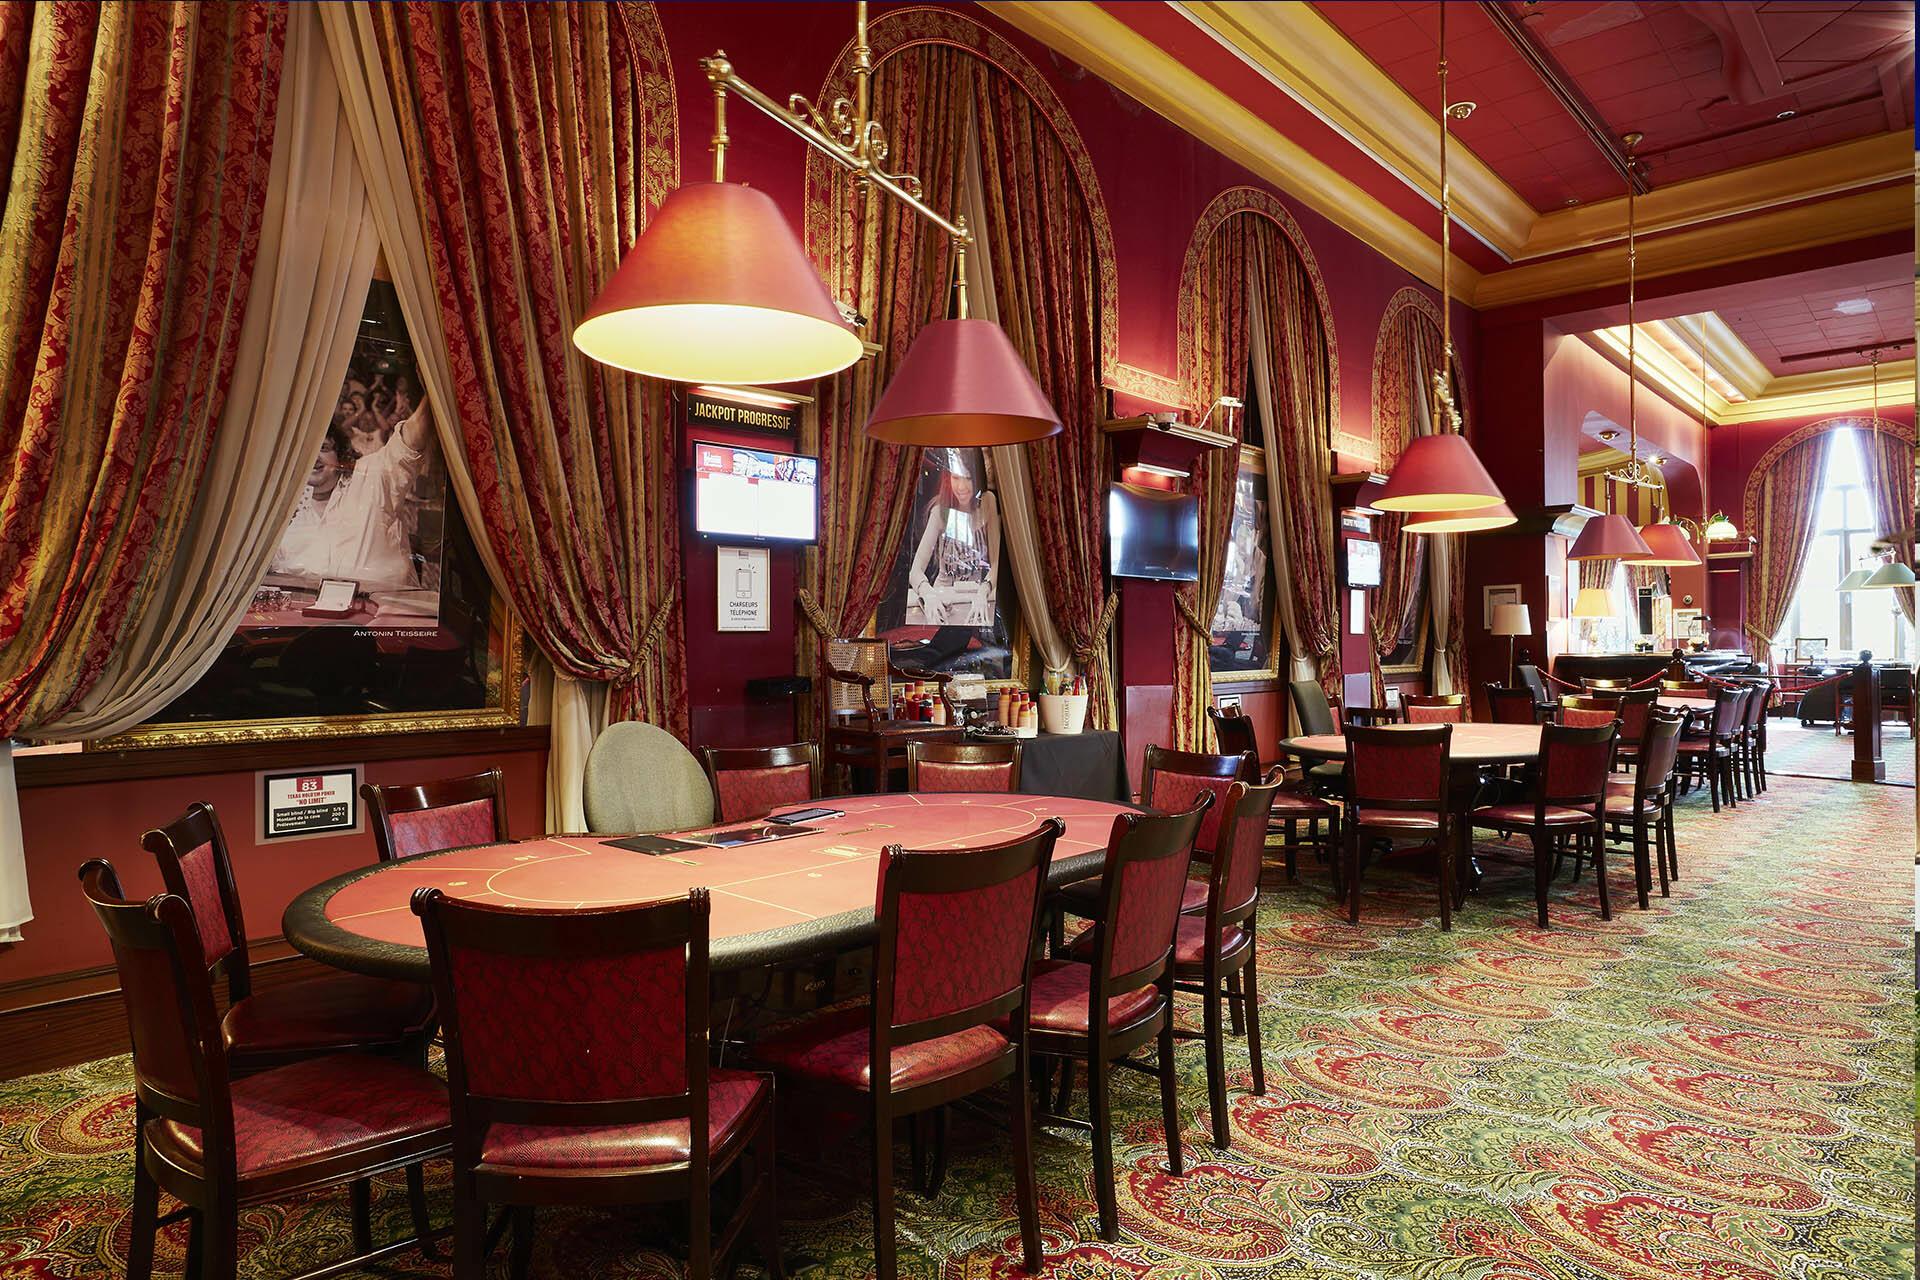 Casino at Domaine de Divonne Hotel in Divonne-les-Bains, France